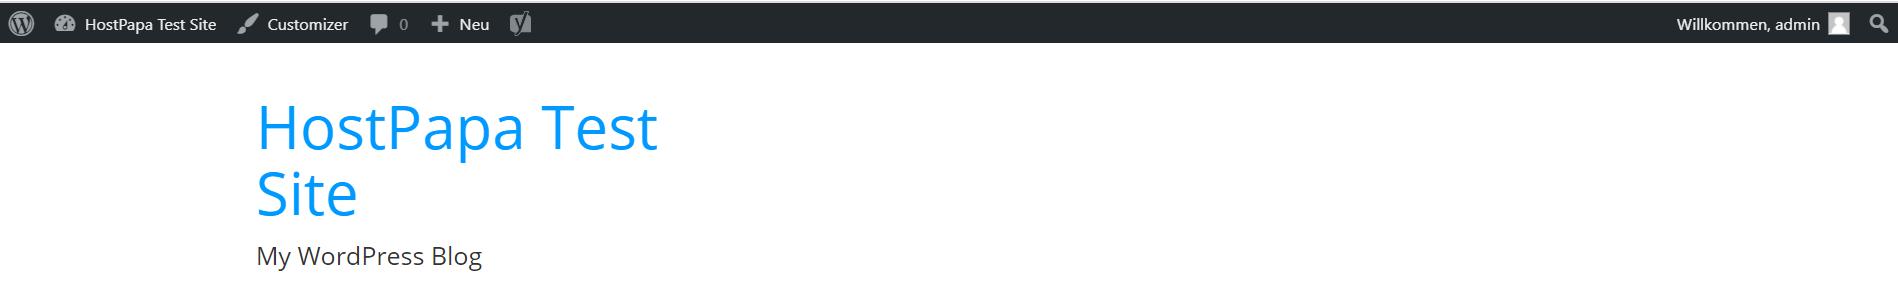 Wordpress dashboard 10